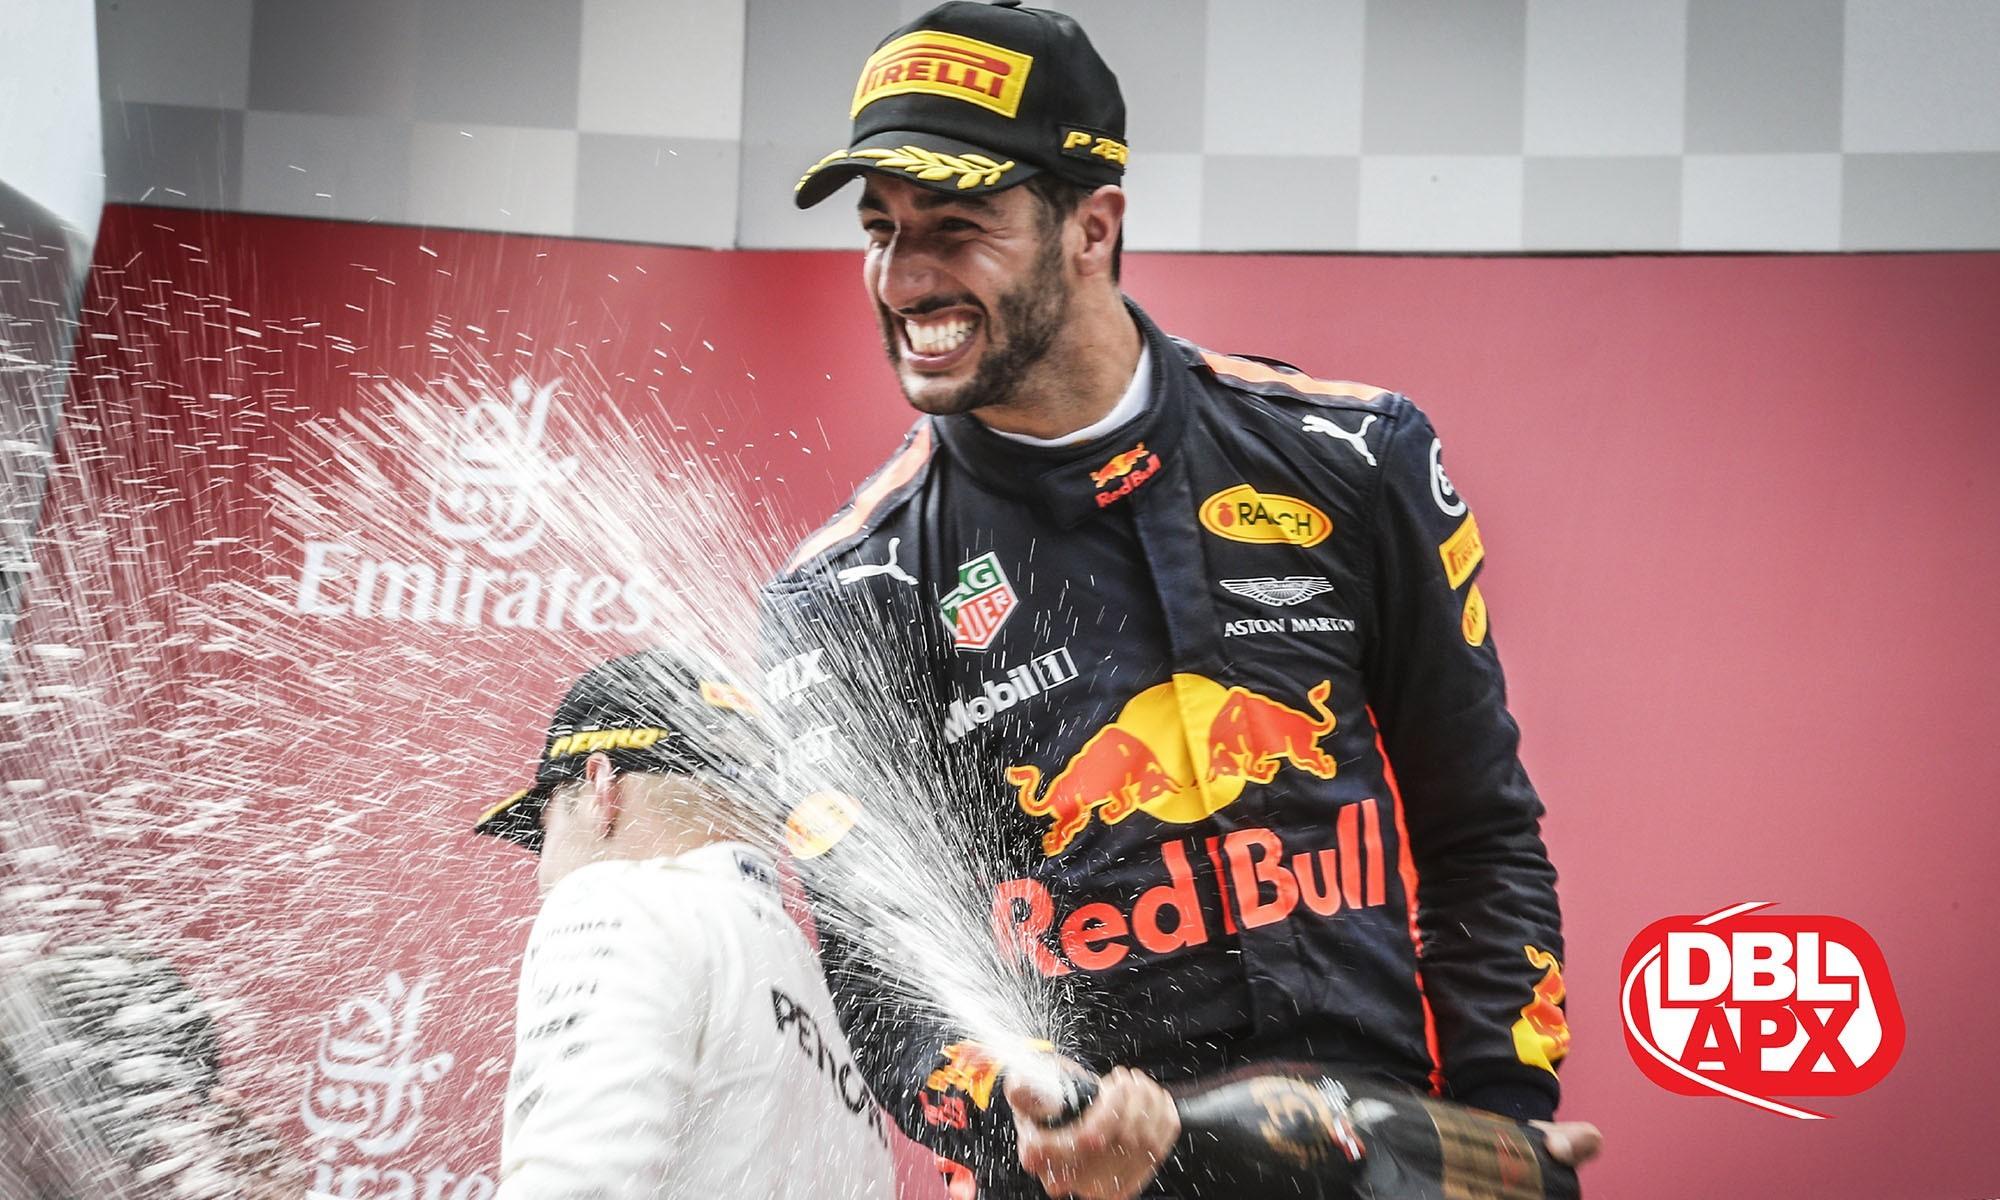 The driver marker hinges on Daniel Ricciardo